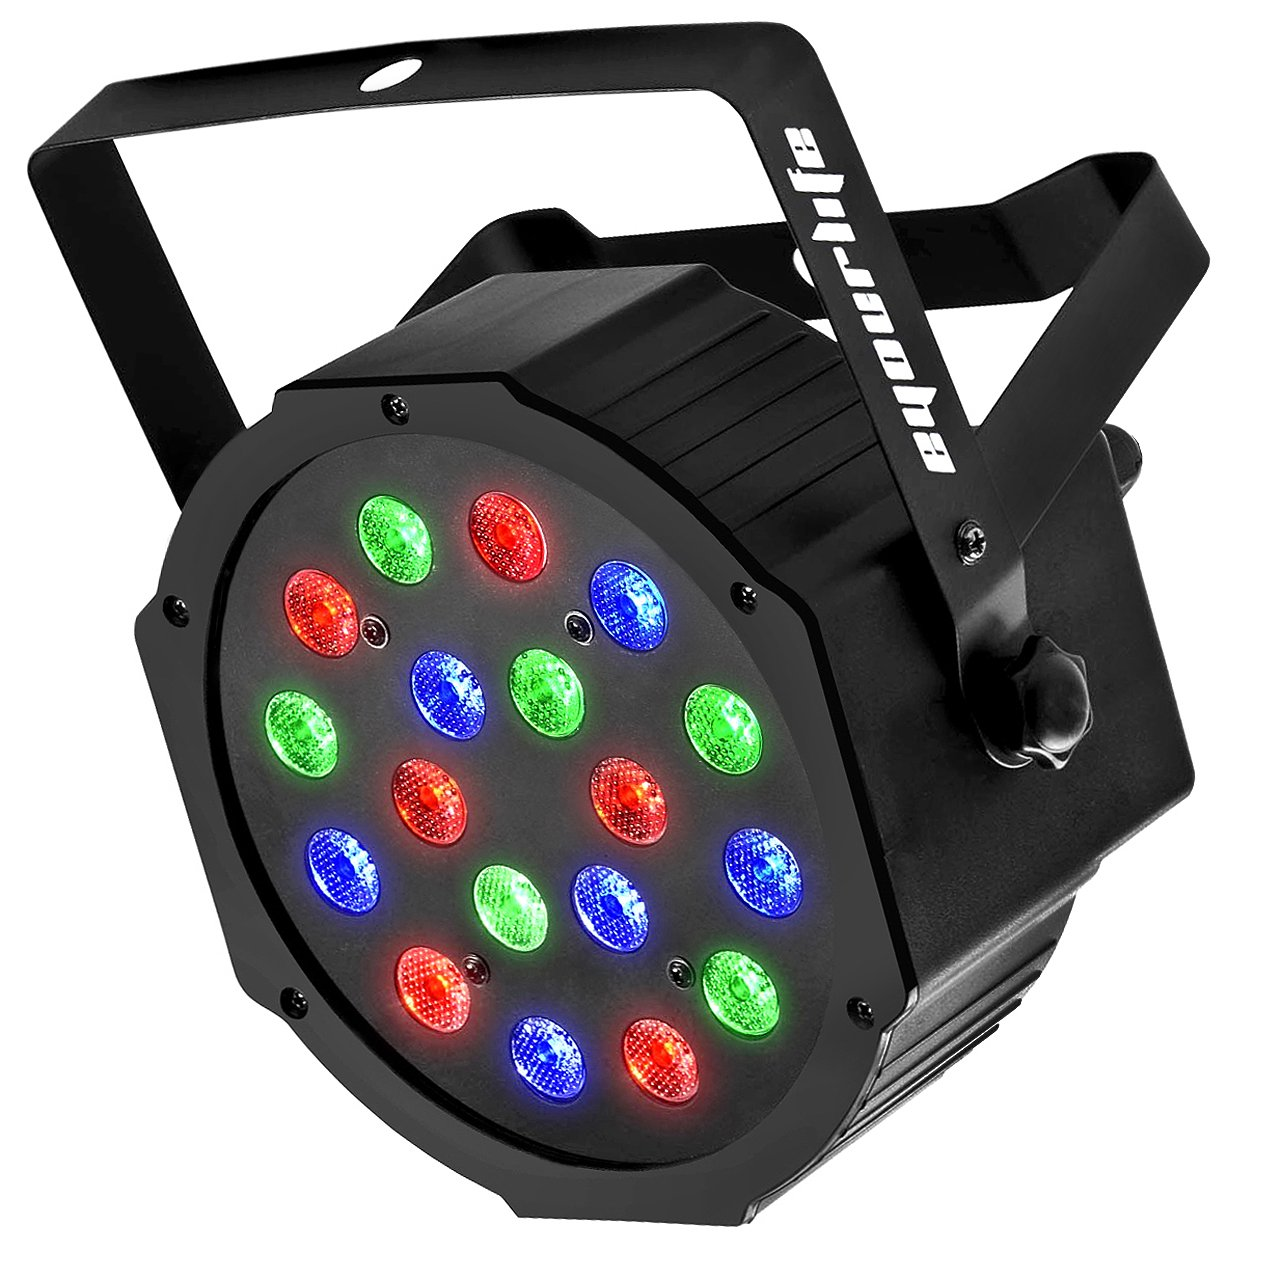 LED Par, Eyourlife LED Partylicht Discolicht Bü hnenlicht Par LED 30W Lichteffekt DMX512 RGB Stage Light 18LEDs -EU Stecker YMFR-18-3W-1Pc